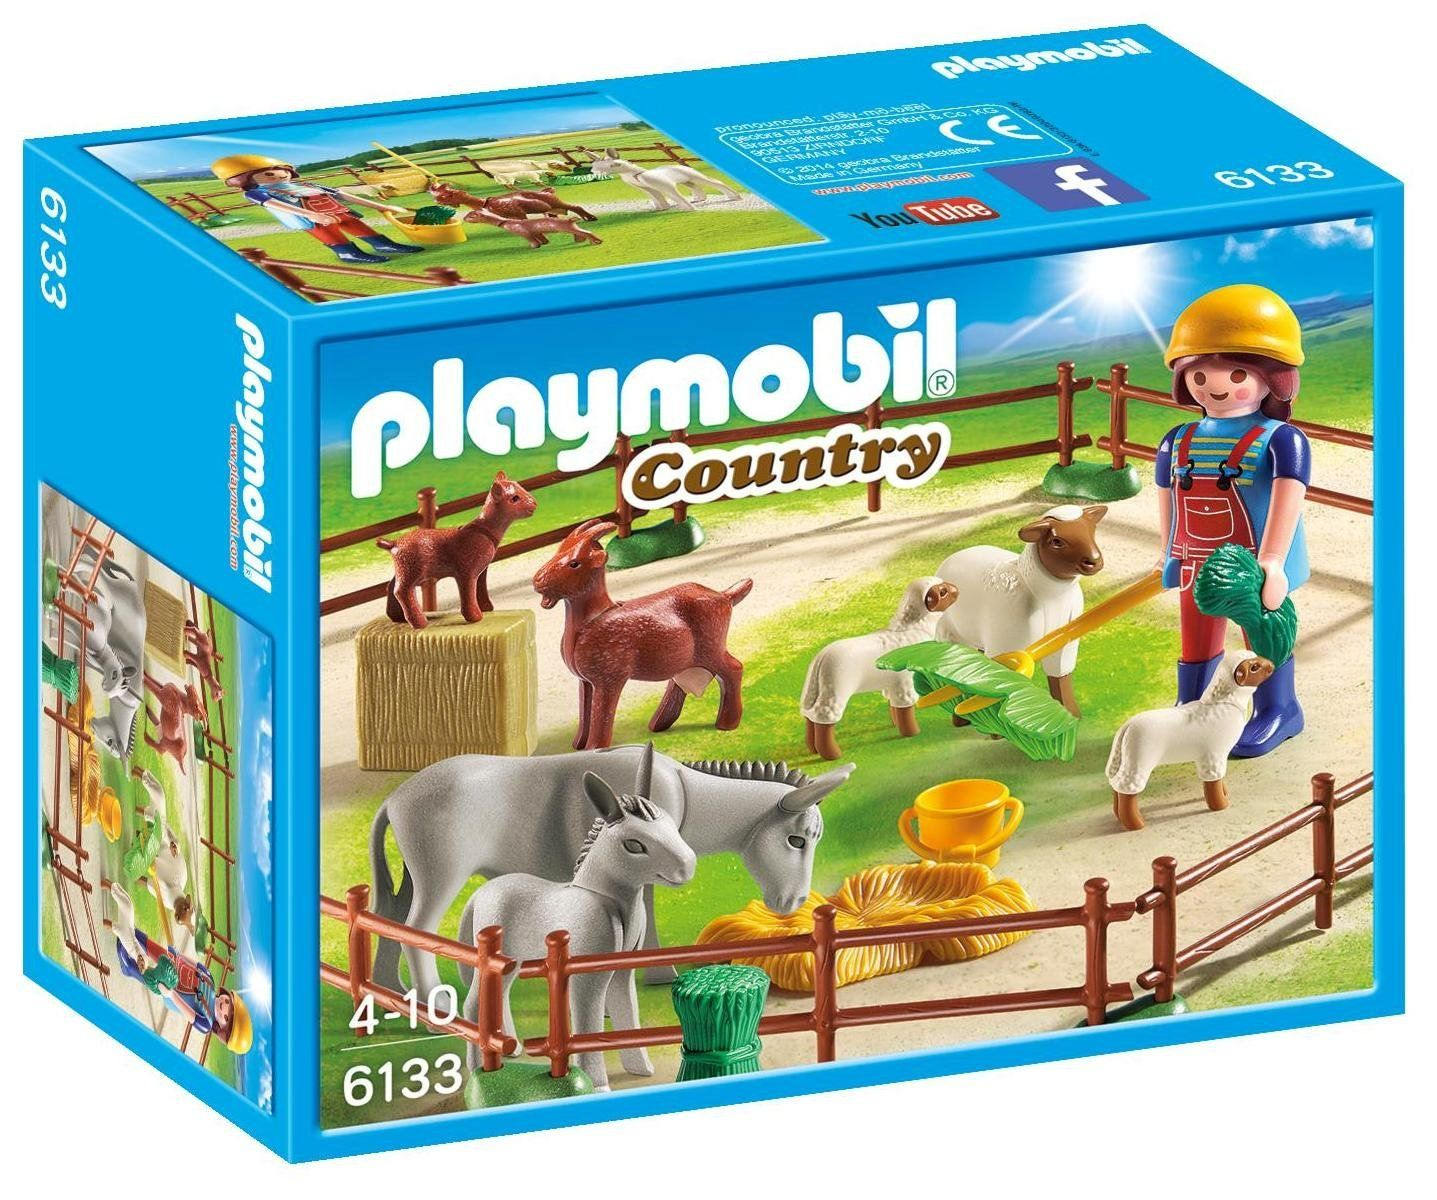 La De Playmobil Granja7 PiesazAmazon esJuguetes 6133Animales byg6f7